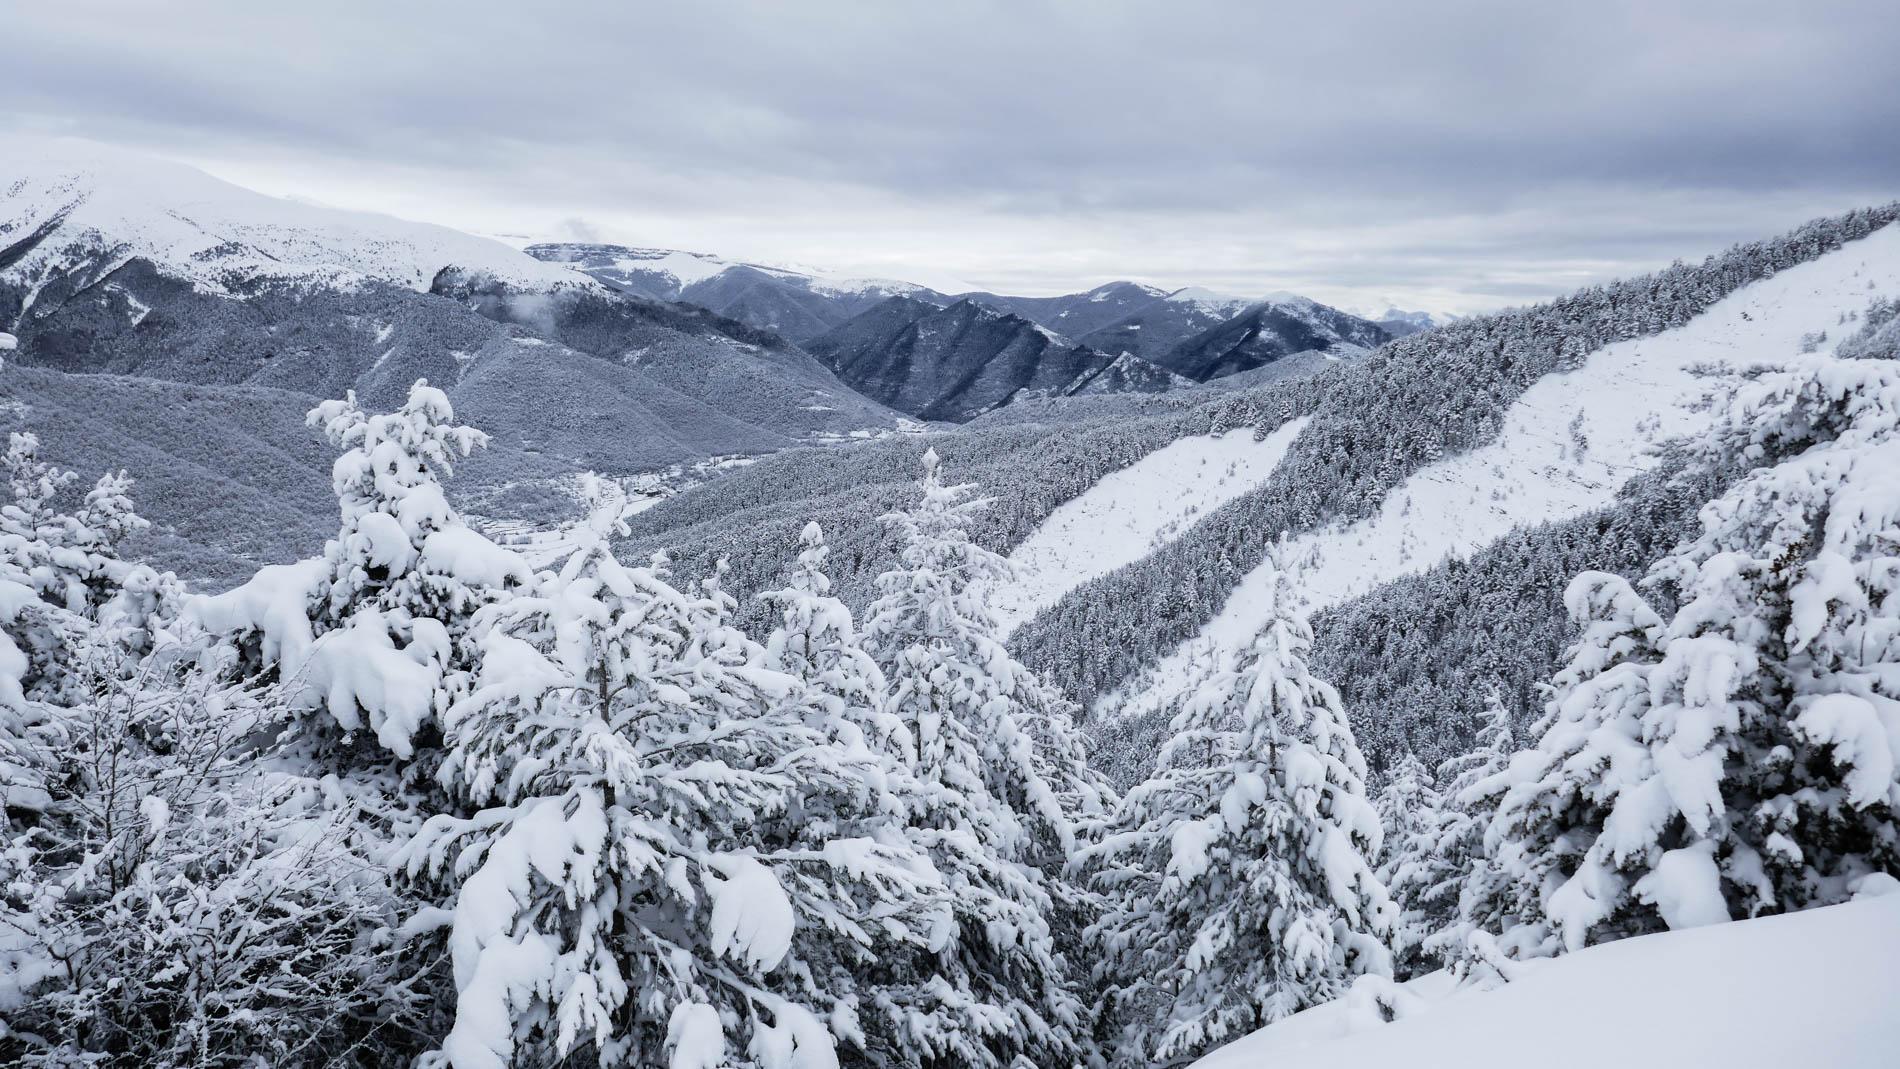 Pelopín desde Cotefablo con esquís de montaña